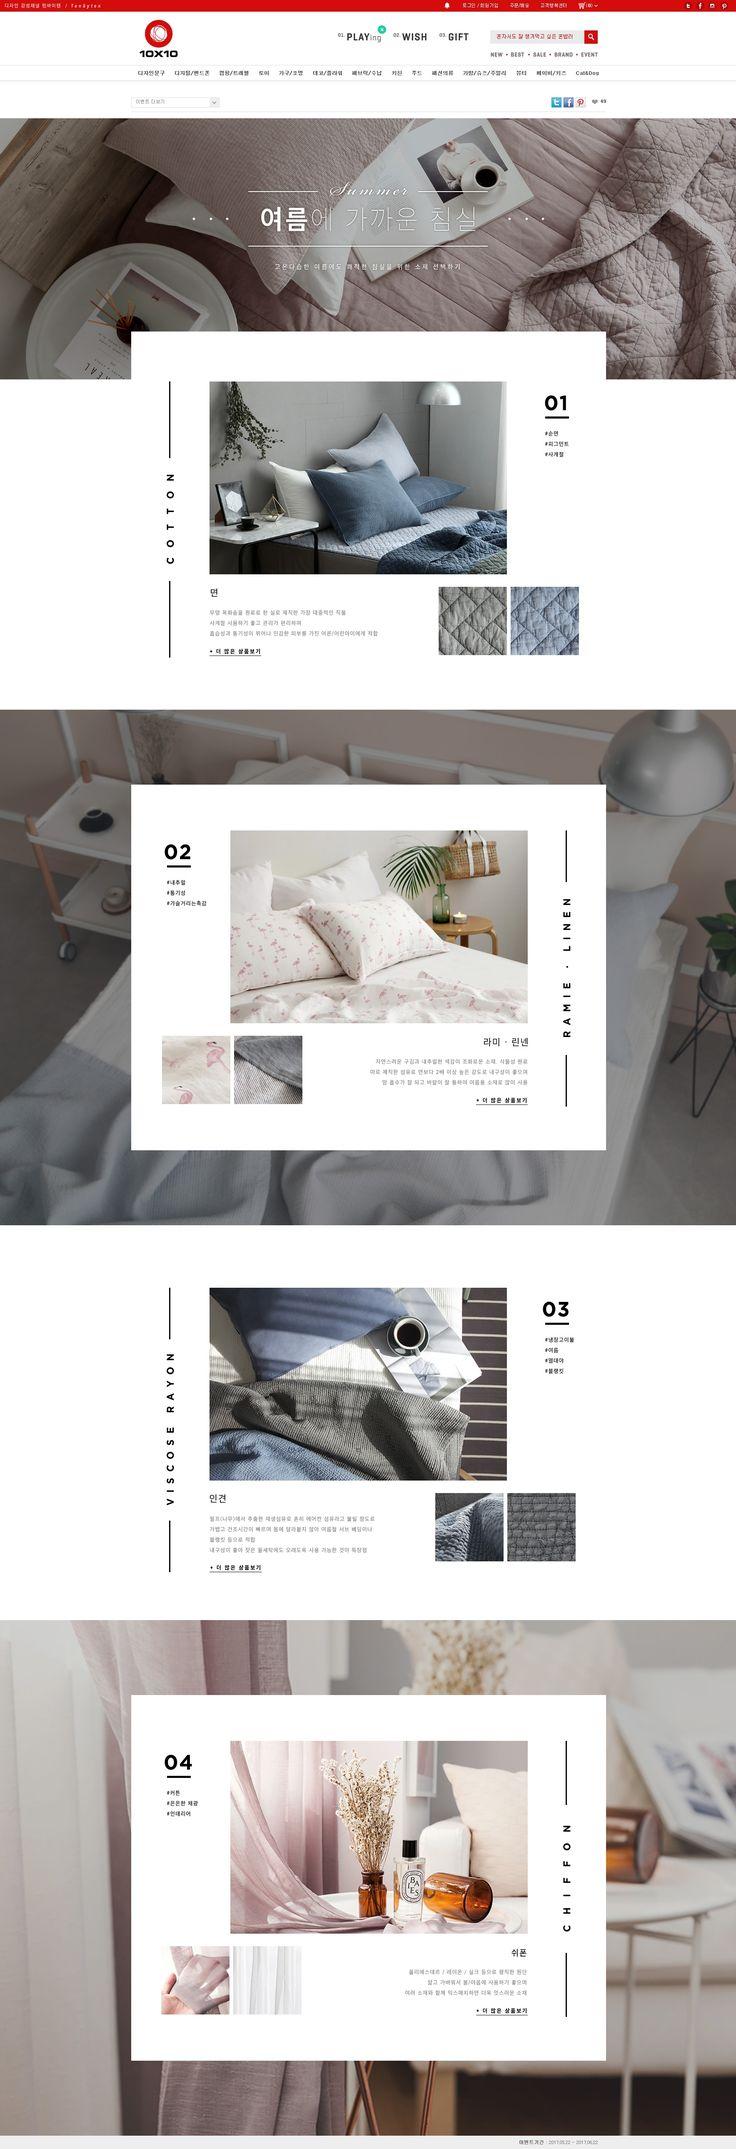 Web Banner Design Web Design Layouts Ad